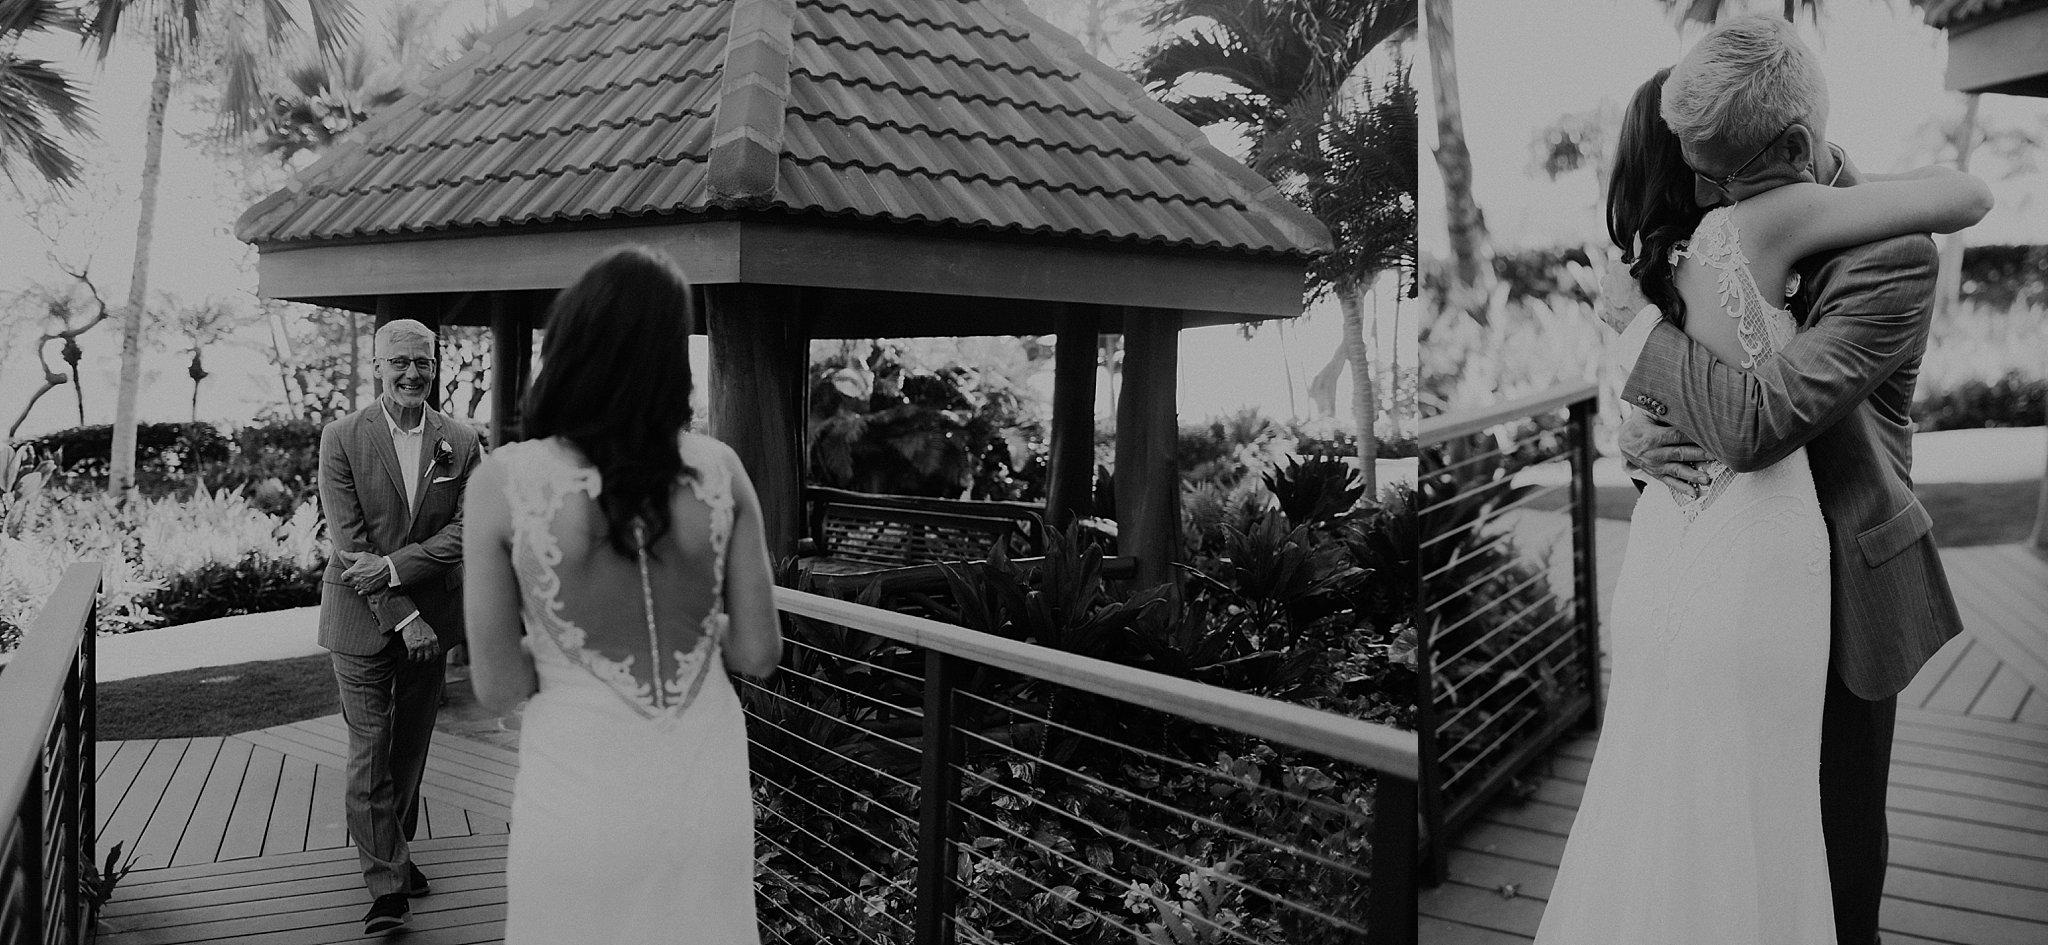 samantha_mcfarlen_bellingham_washington_engagement_photography_seattle_wedding_photographer_0194.jpg